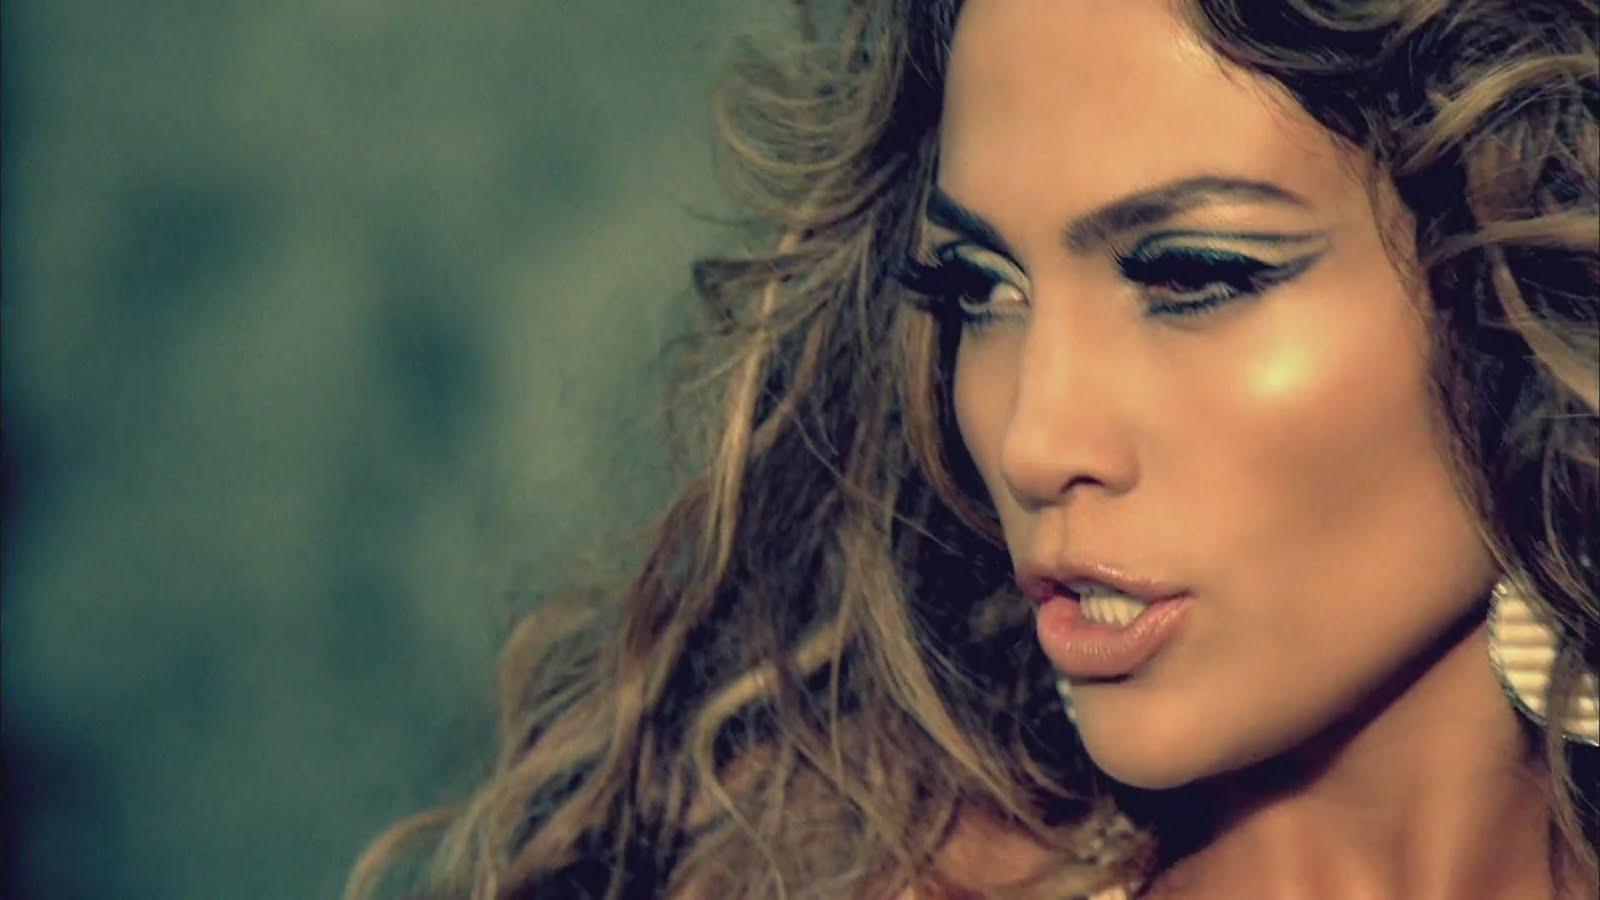 http://3.bp.blogspot.com/-omLRURvMalM/UBrCAwVHjbI/AAAAAAAAALQ/qQ90xzgaWA8/s1600/Jennifer+Lopez.jpg